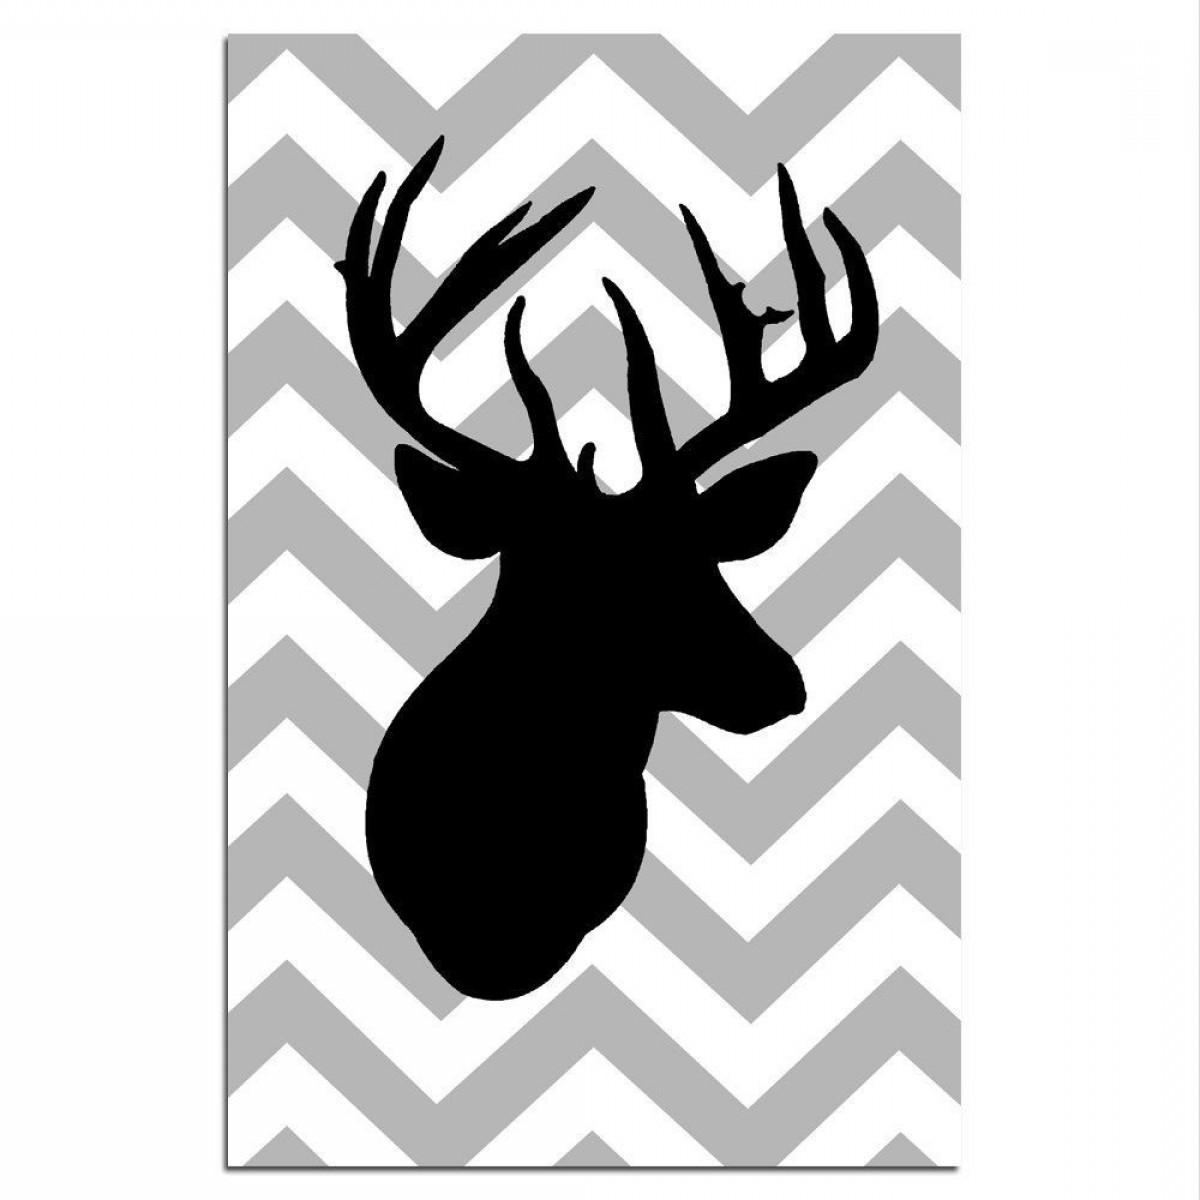 Wide deer antler clipart clipart free library Deer Antler Silhouette Vector Art   SOIDERGI clipart free library